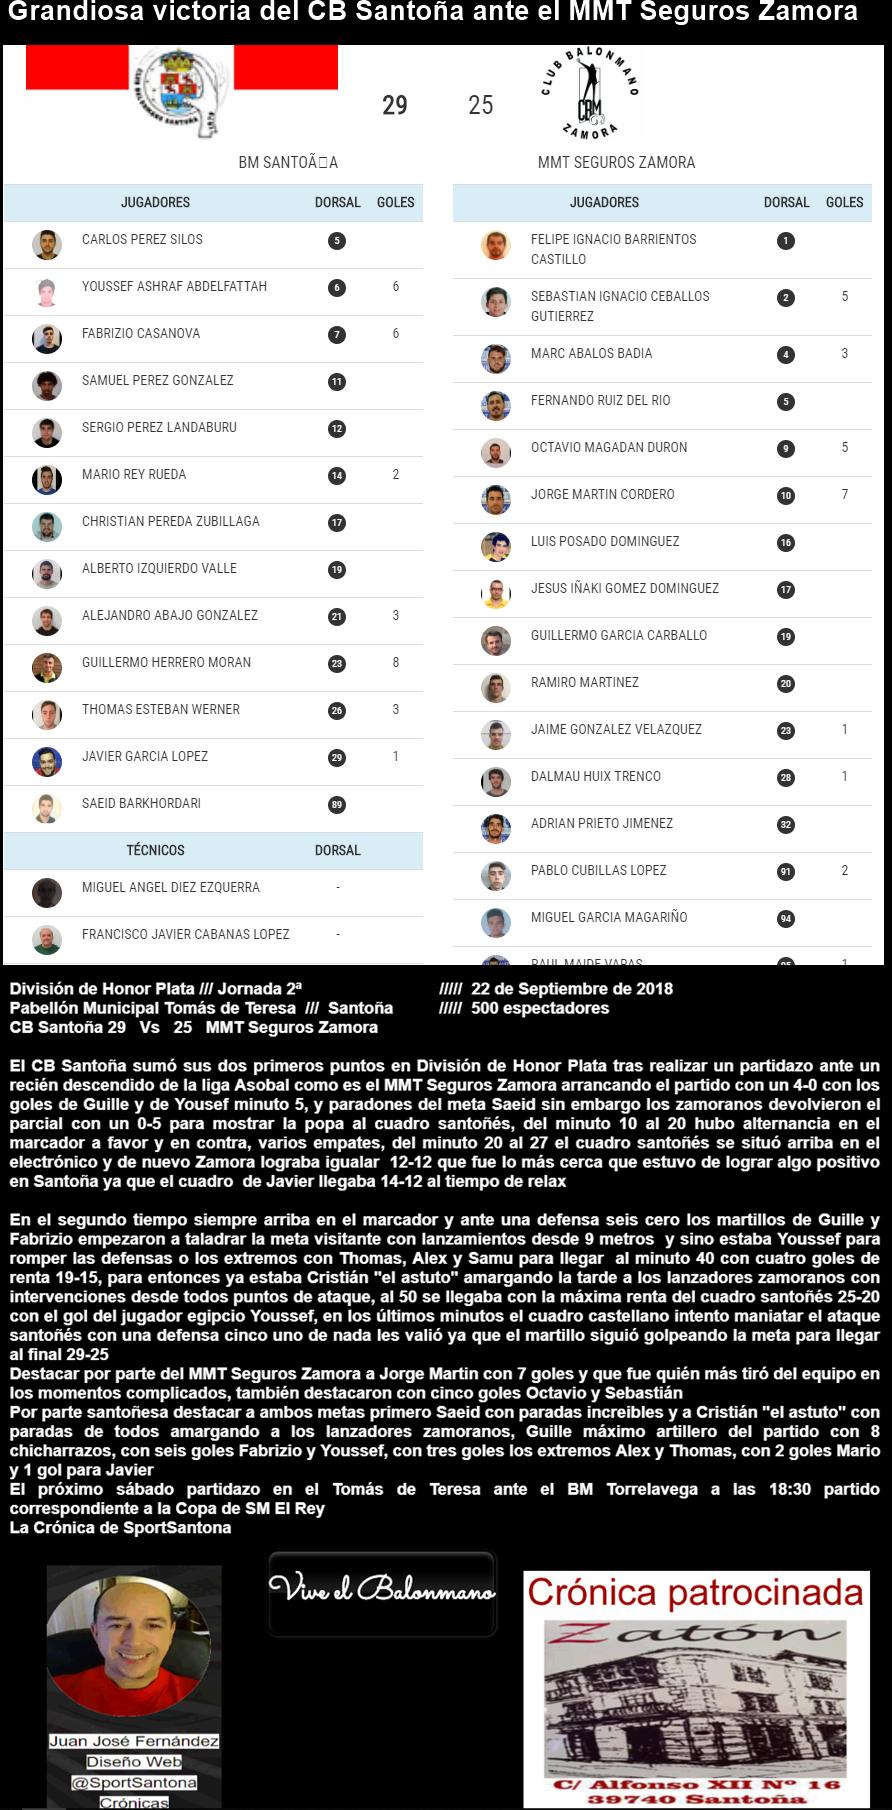 Crónica BM Santoña 29 - 25 MMT Seguros Zamora